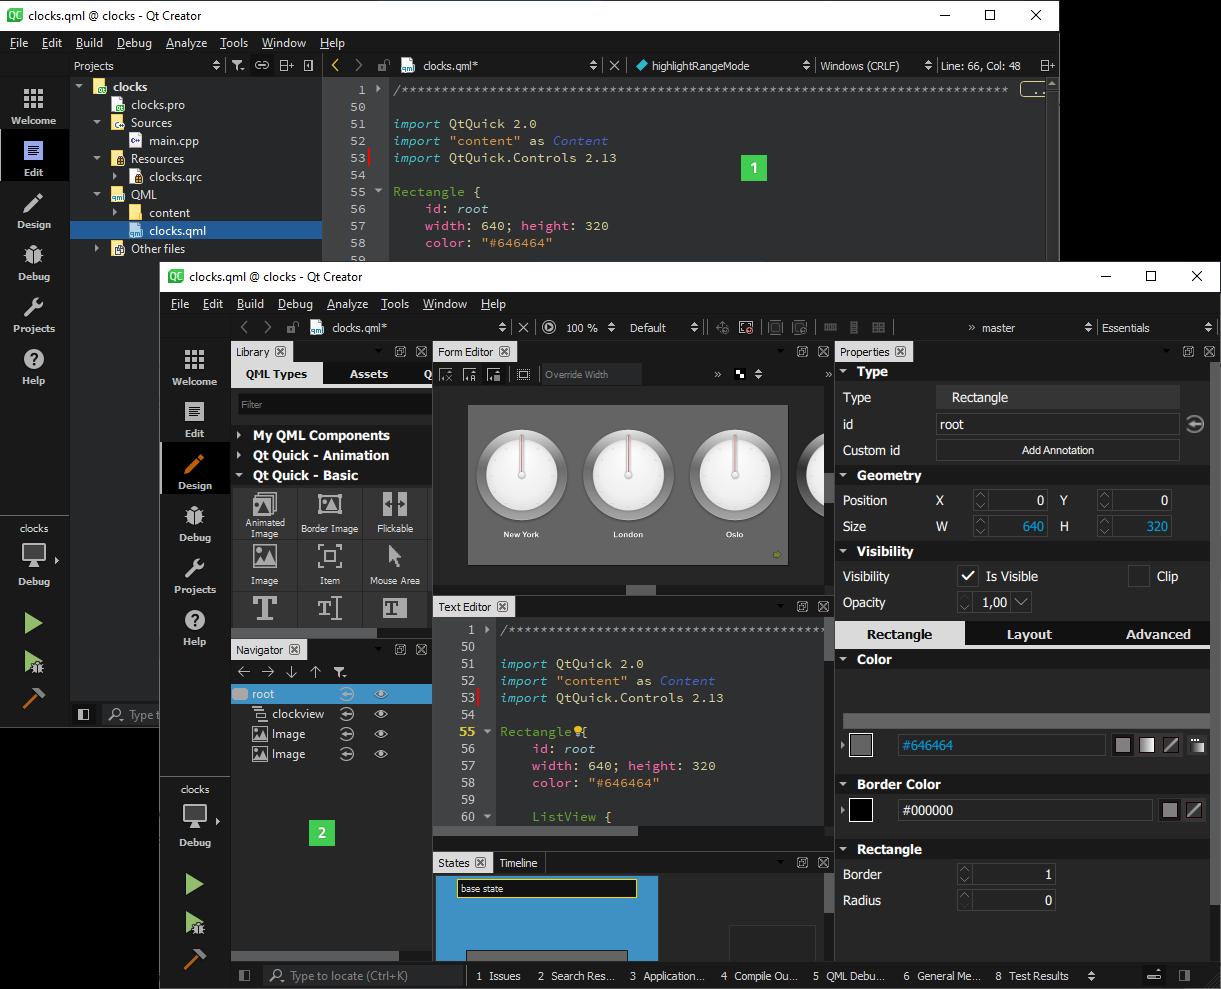 C++图形用户界面开发框架Qt - 开发工具图